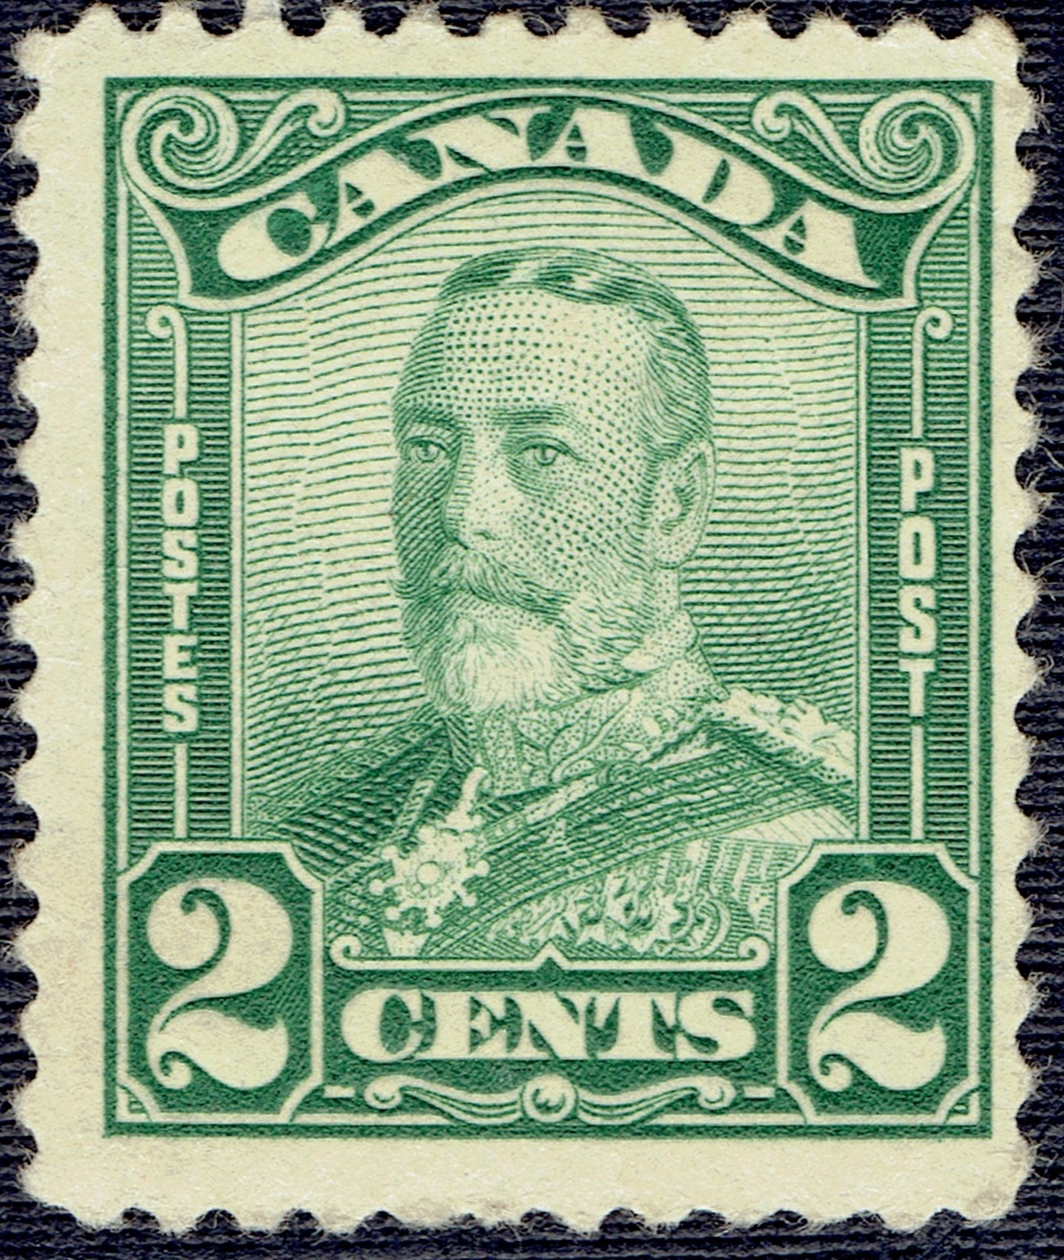 Canada - Scott #150 (1928)